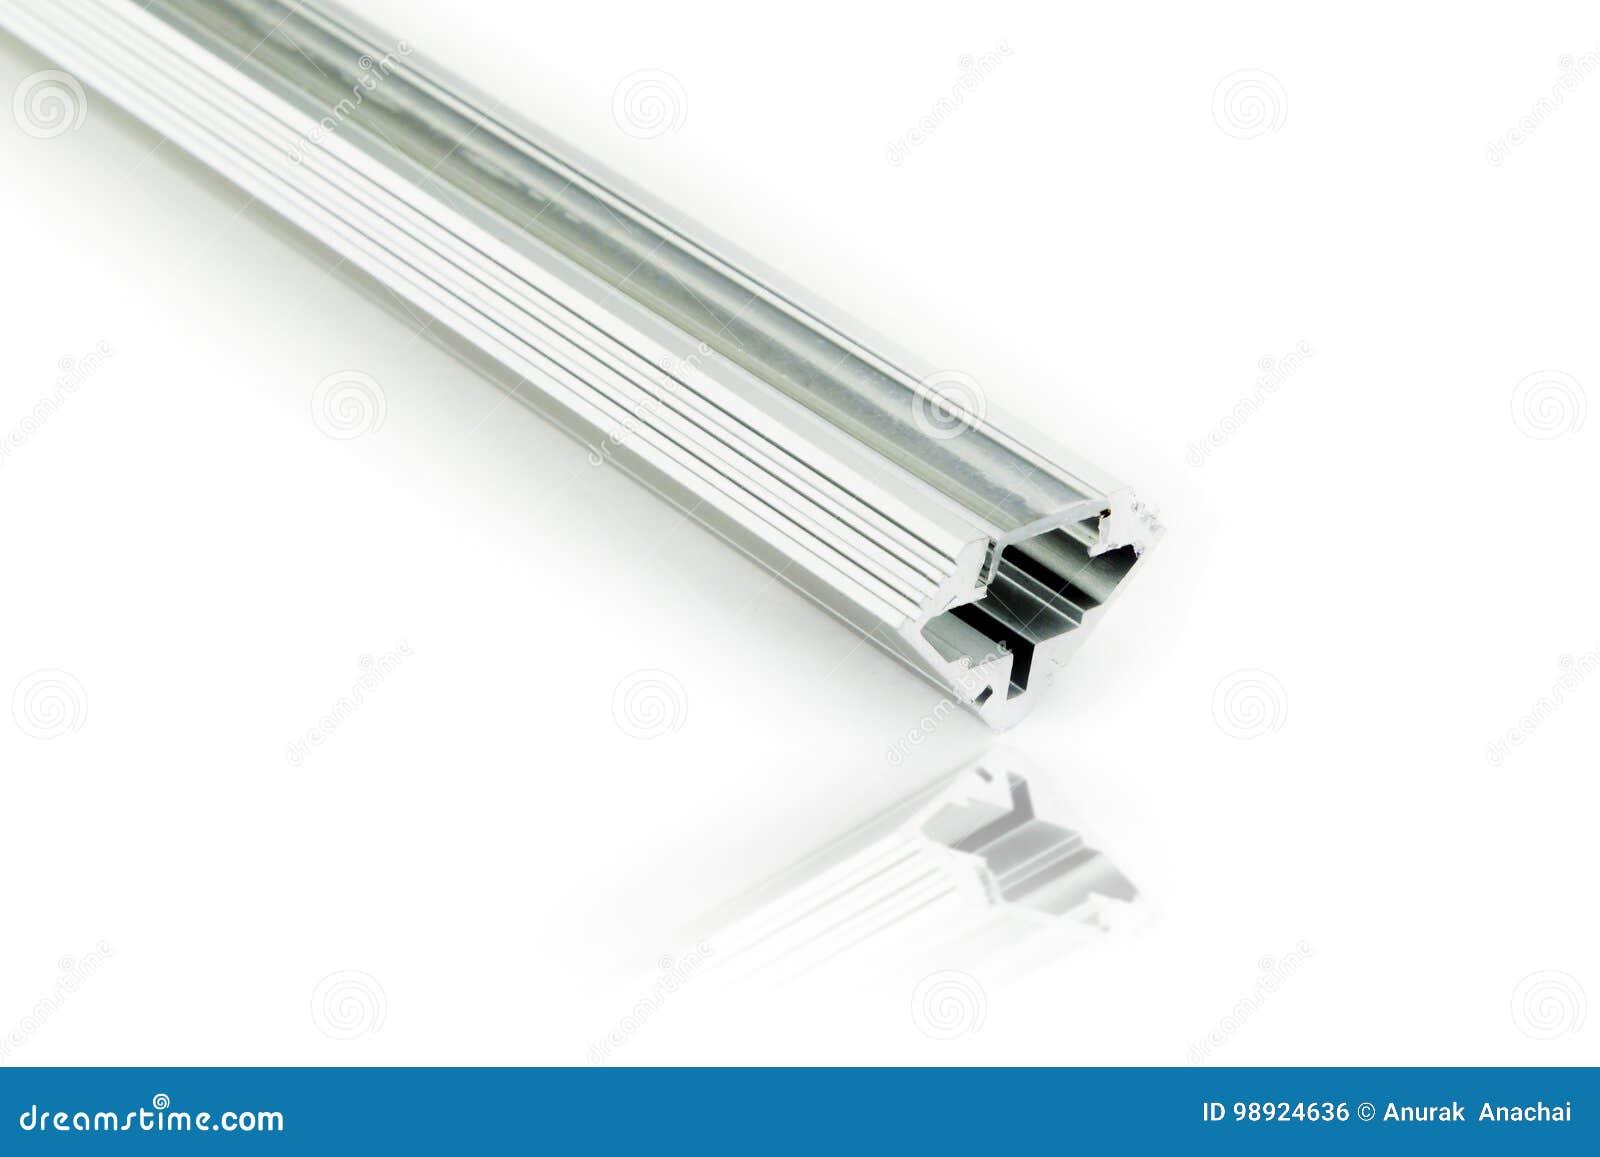 Tab Light Aluminium Profiles Stock Photo - Image of decoration